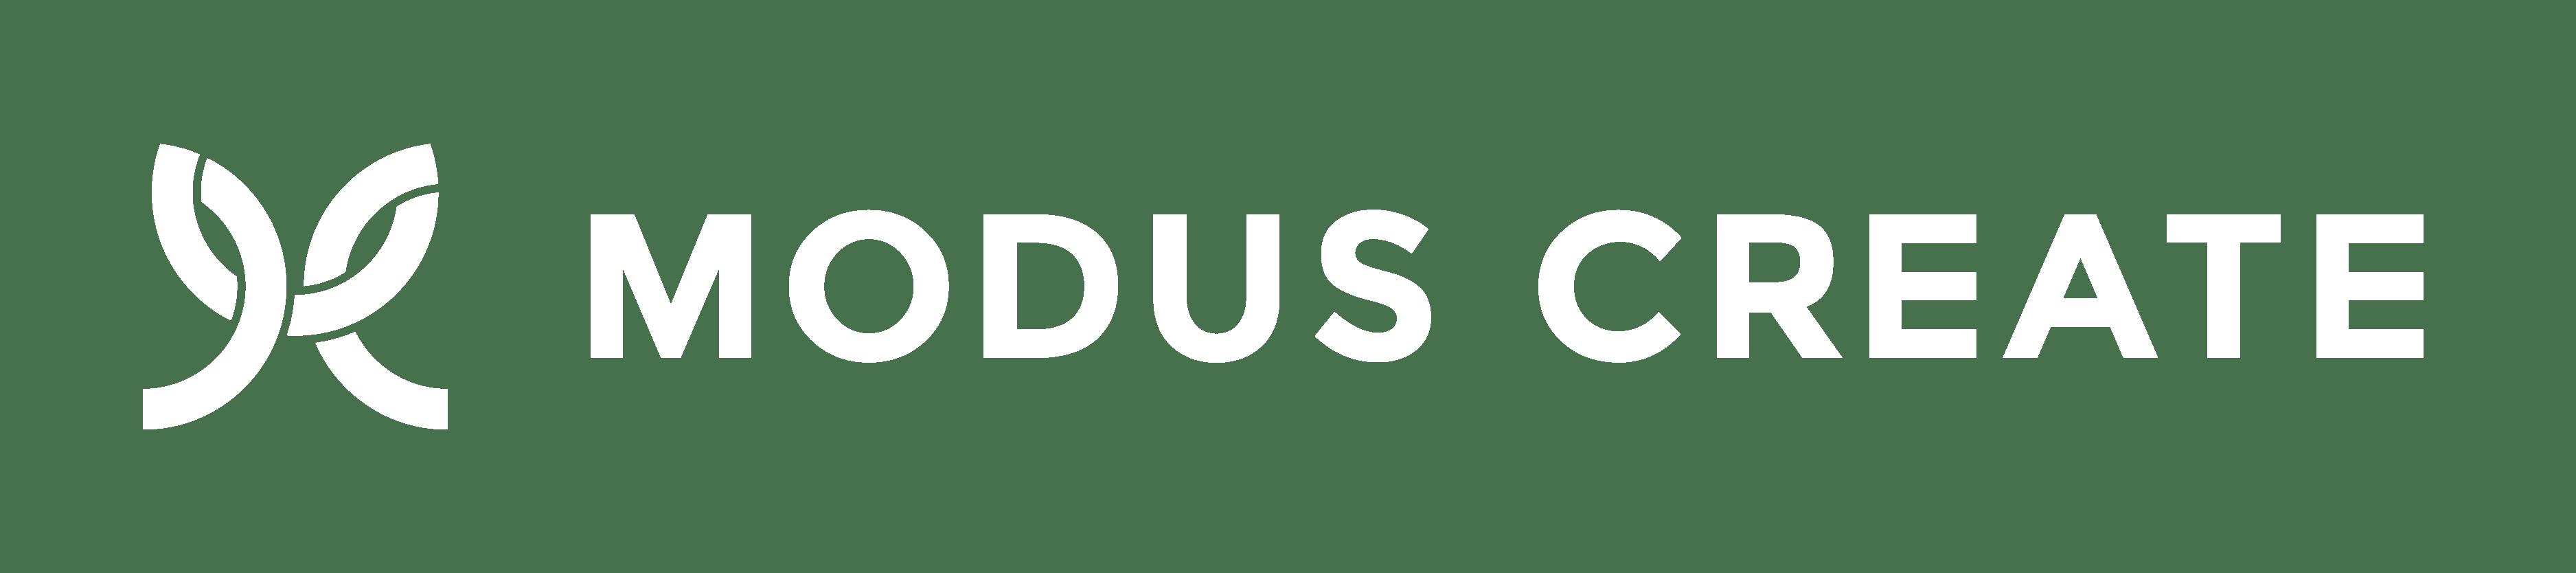 modus create logo_white